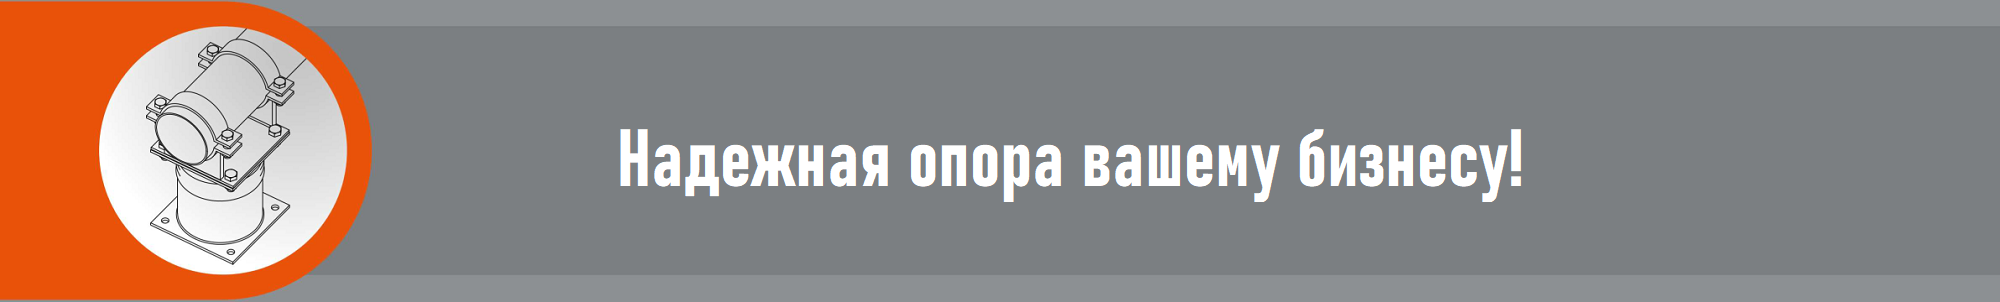 "ООО ""ОПС"", Москва"